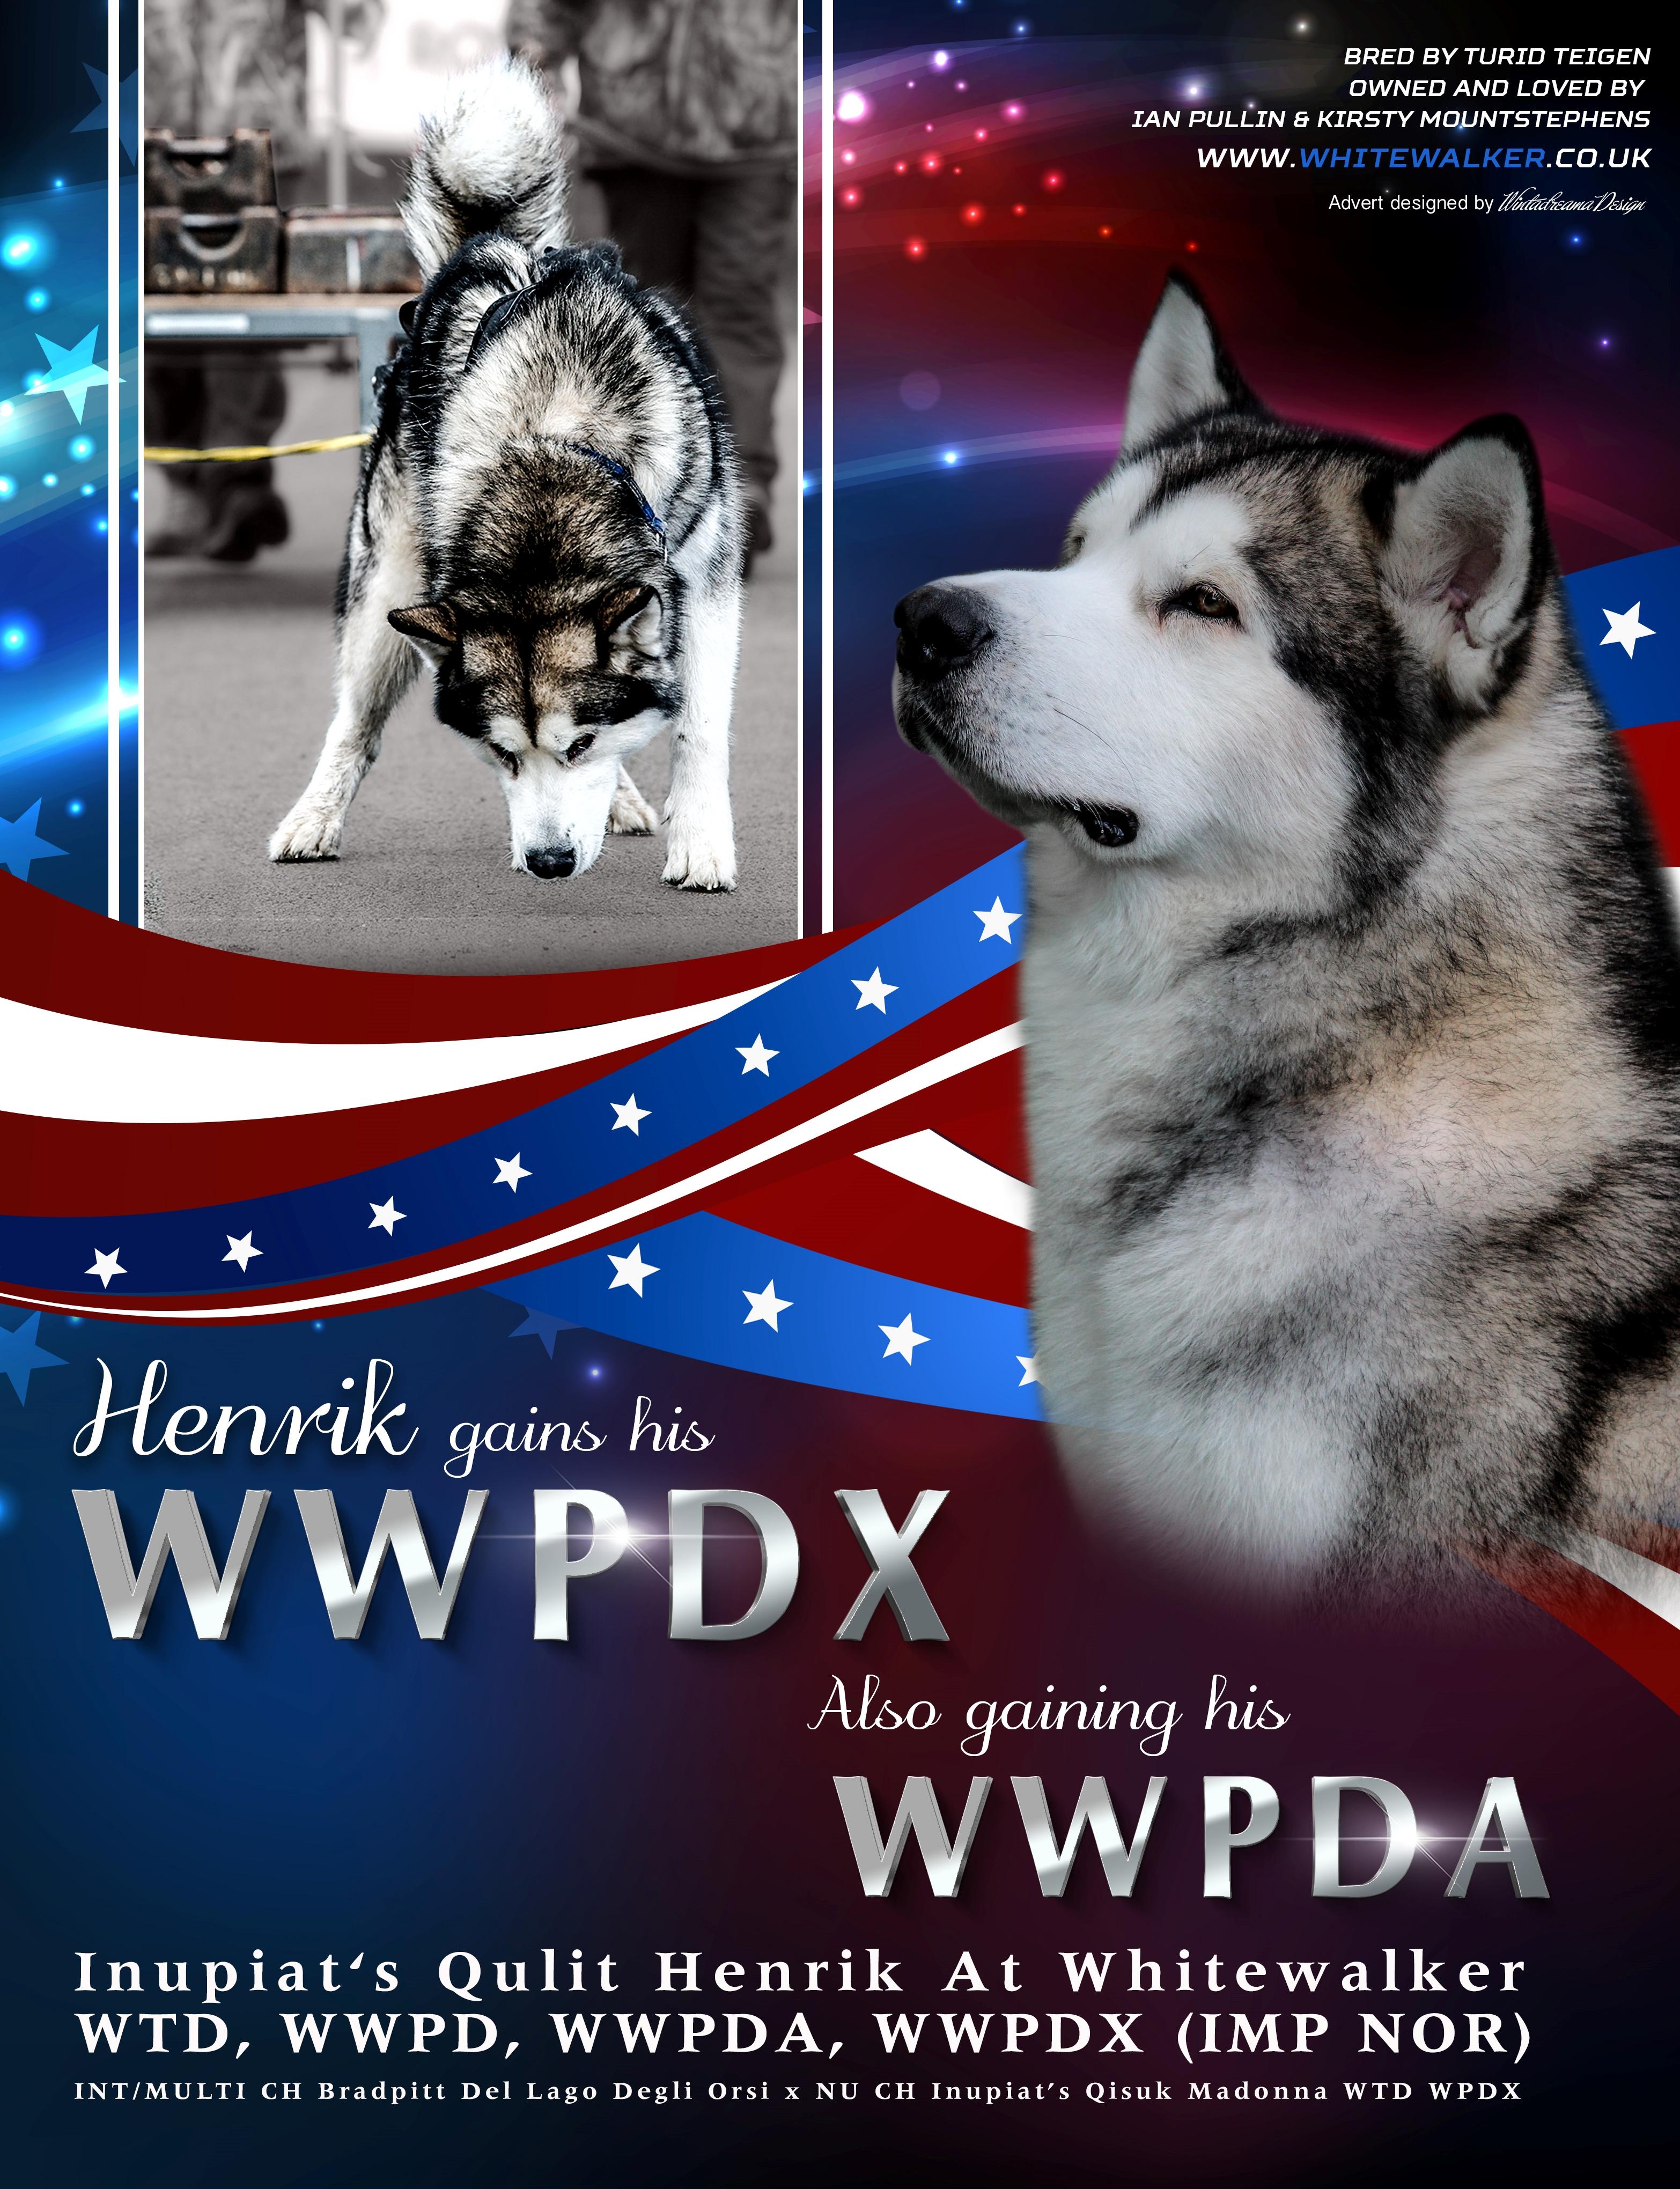 Henrik WWPDX